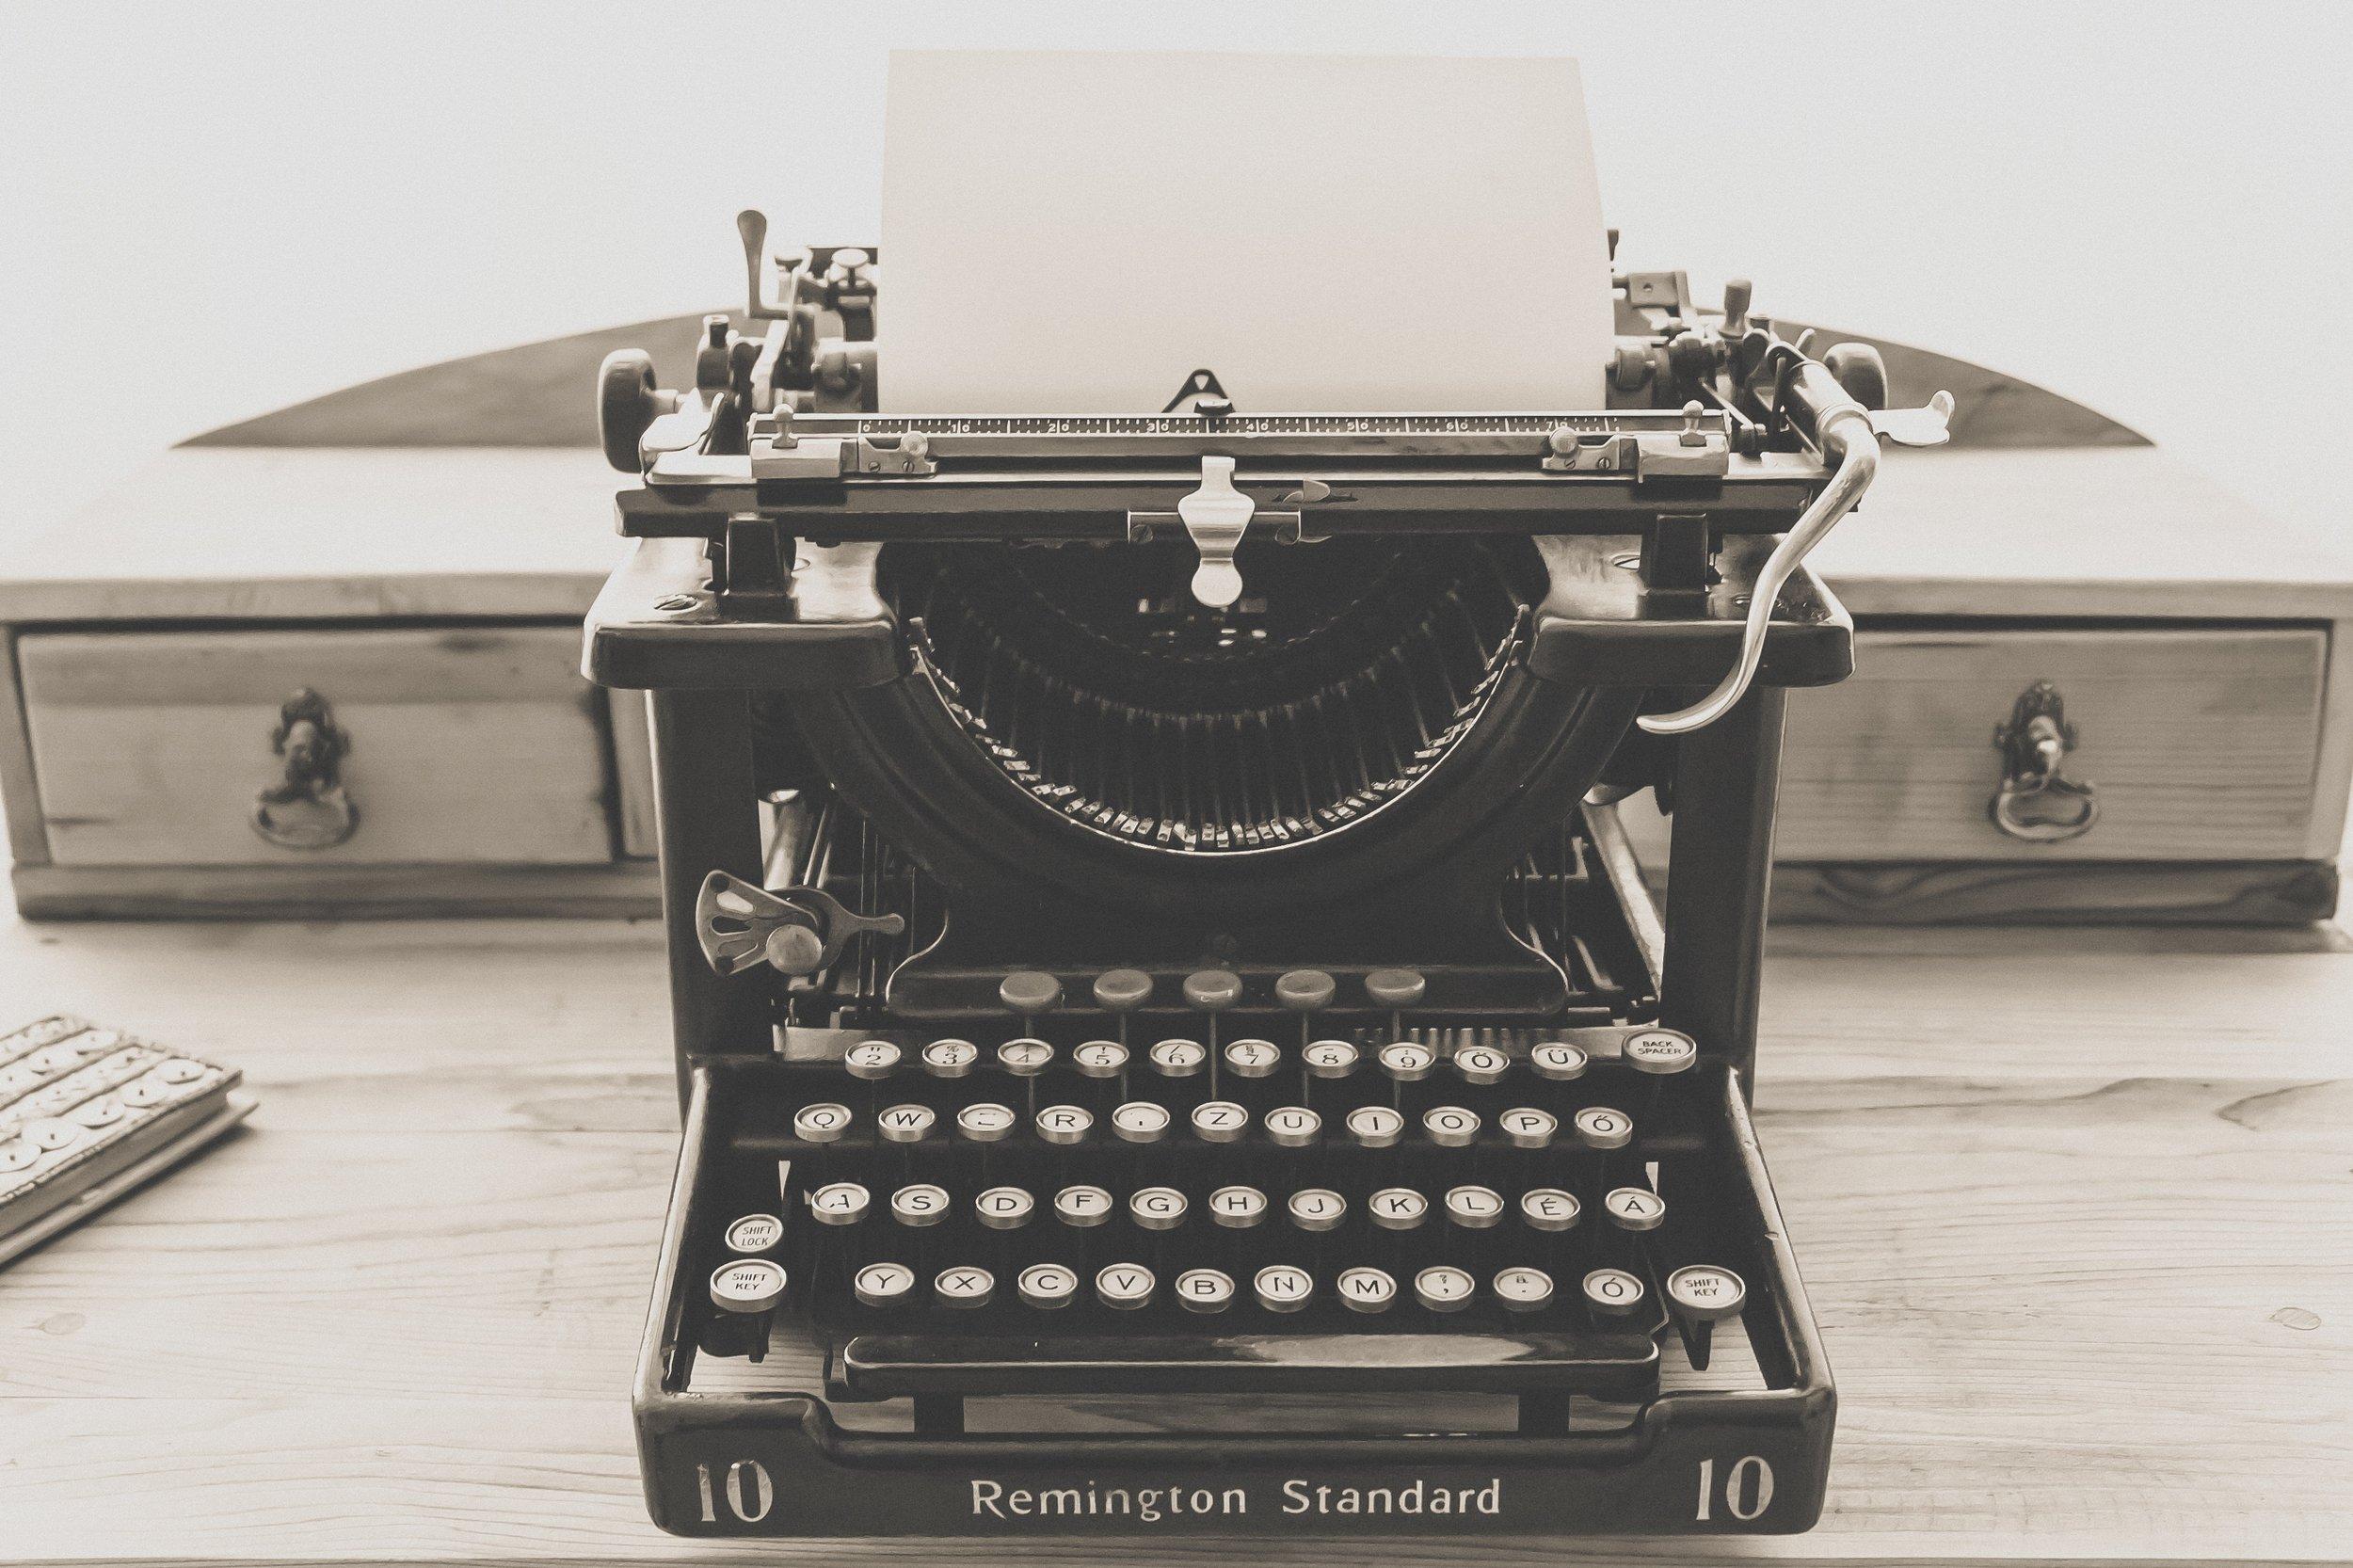 typewriter-vintage-old-vintage-typewriter-163116.jpg